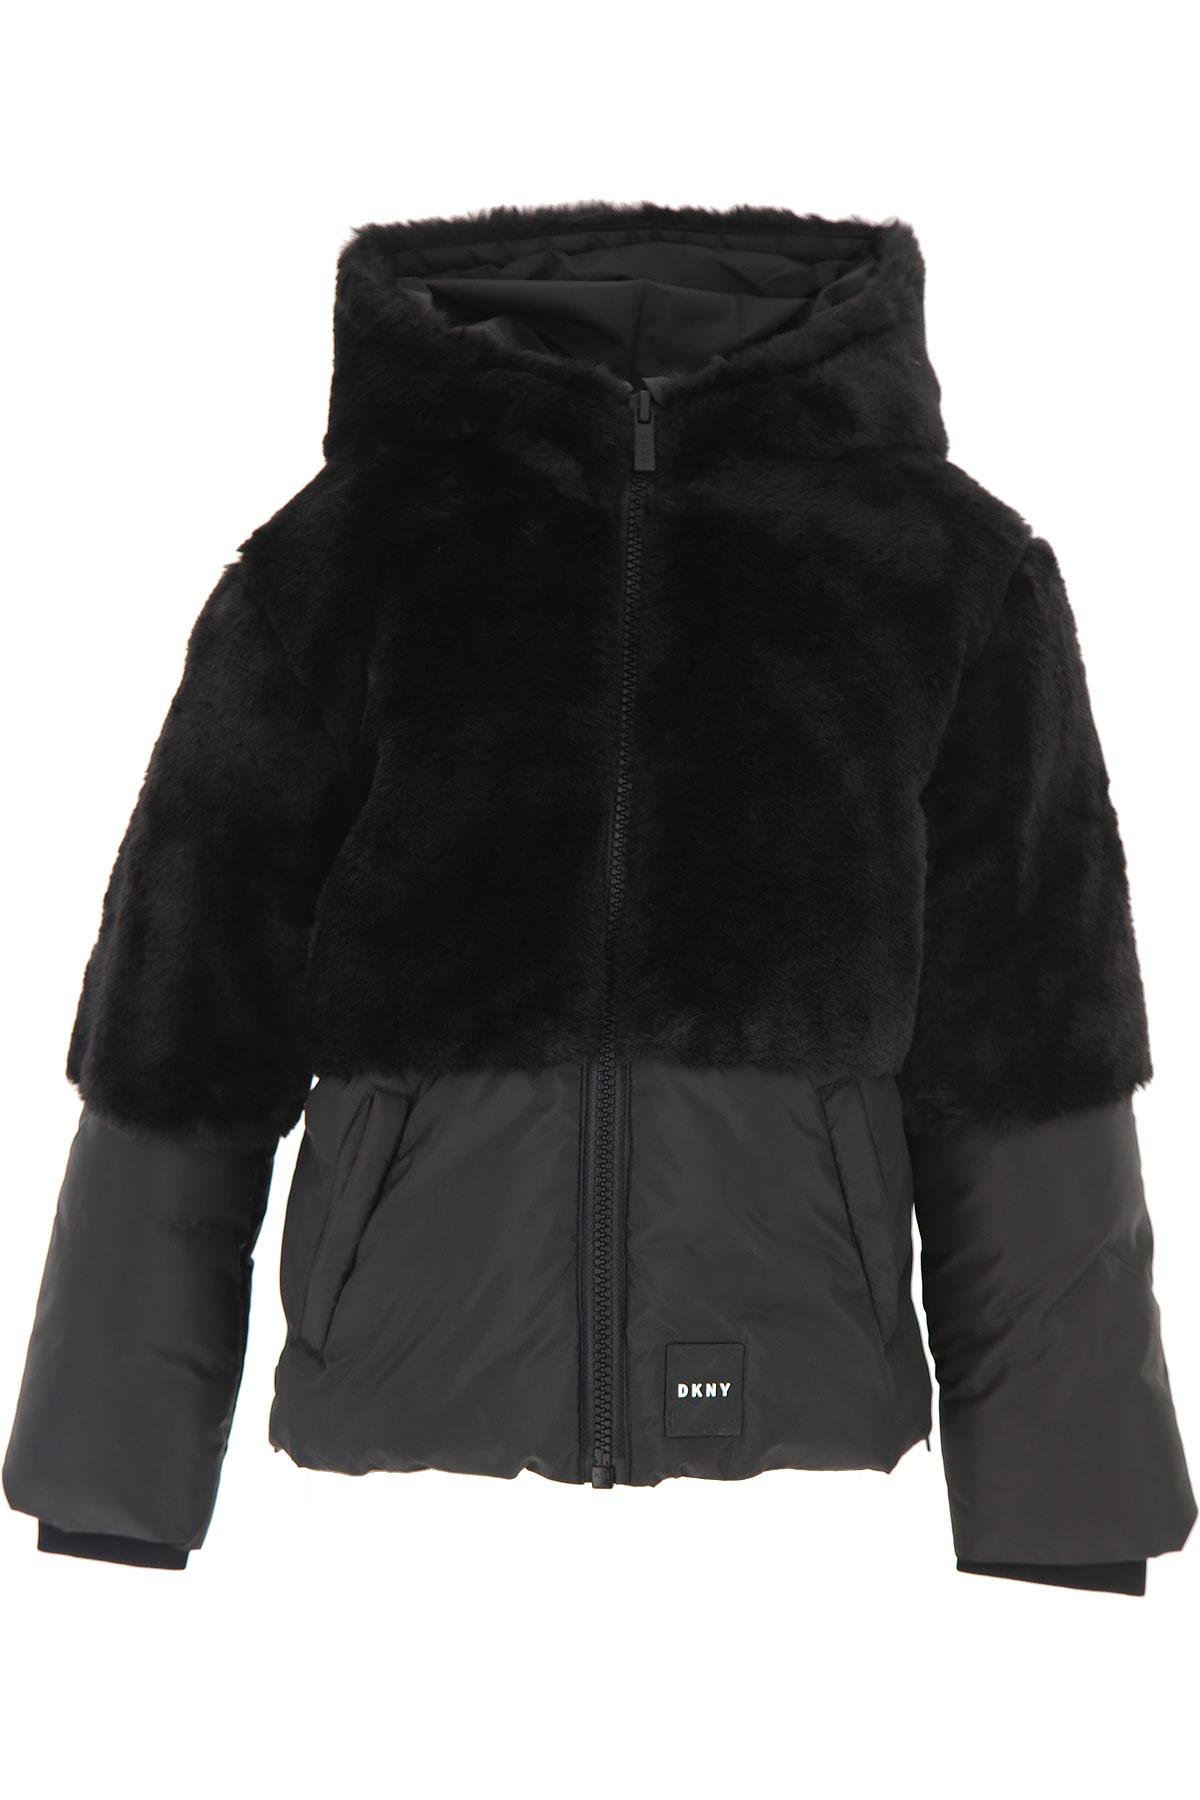 DKNY Girls Down Jacket for Kids, Puffer Ski Jacket On Sale, Black, polyester, 2019, 10Y 14Y 8Y